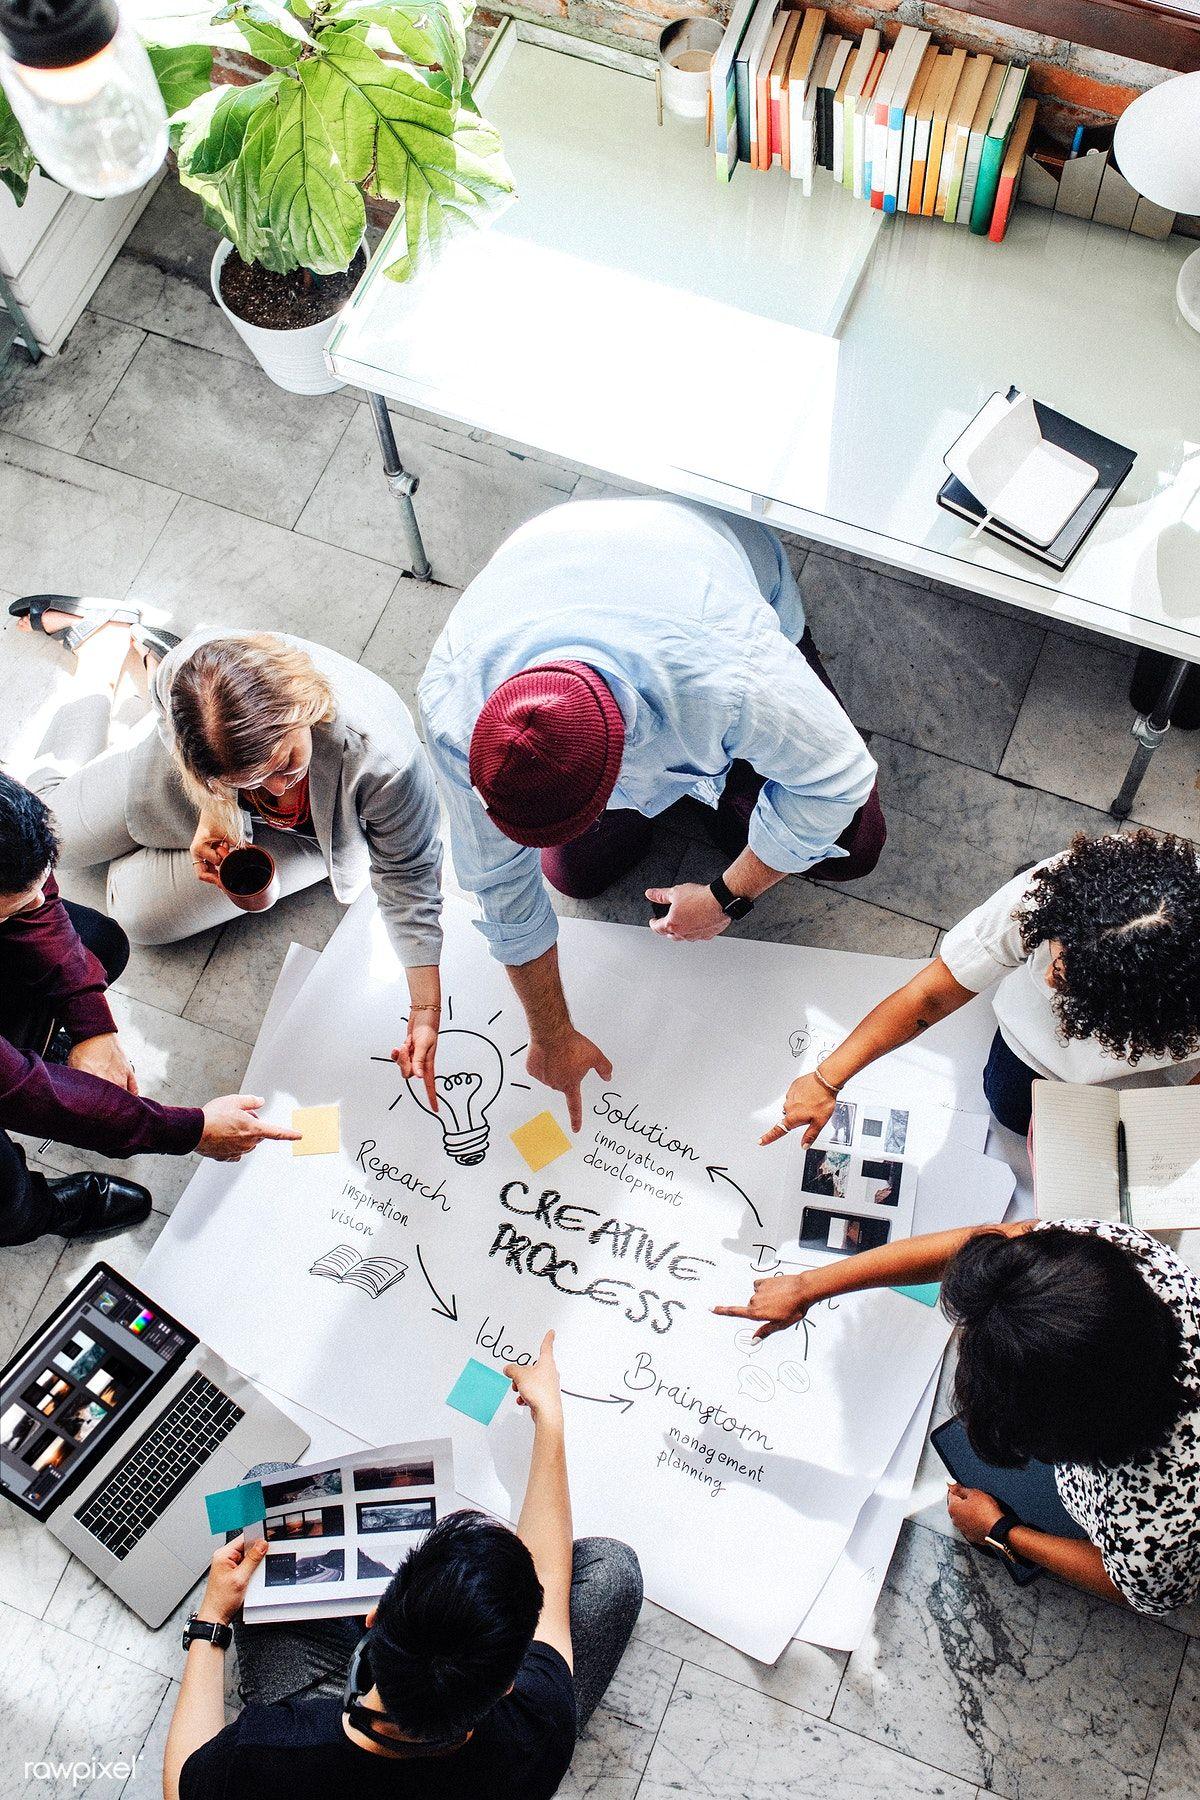 Download Premium Image Of Business People Brainstorming Management